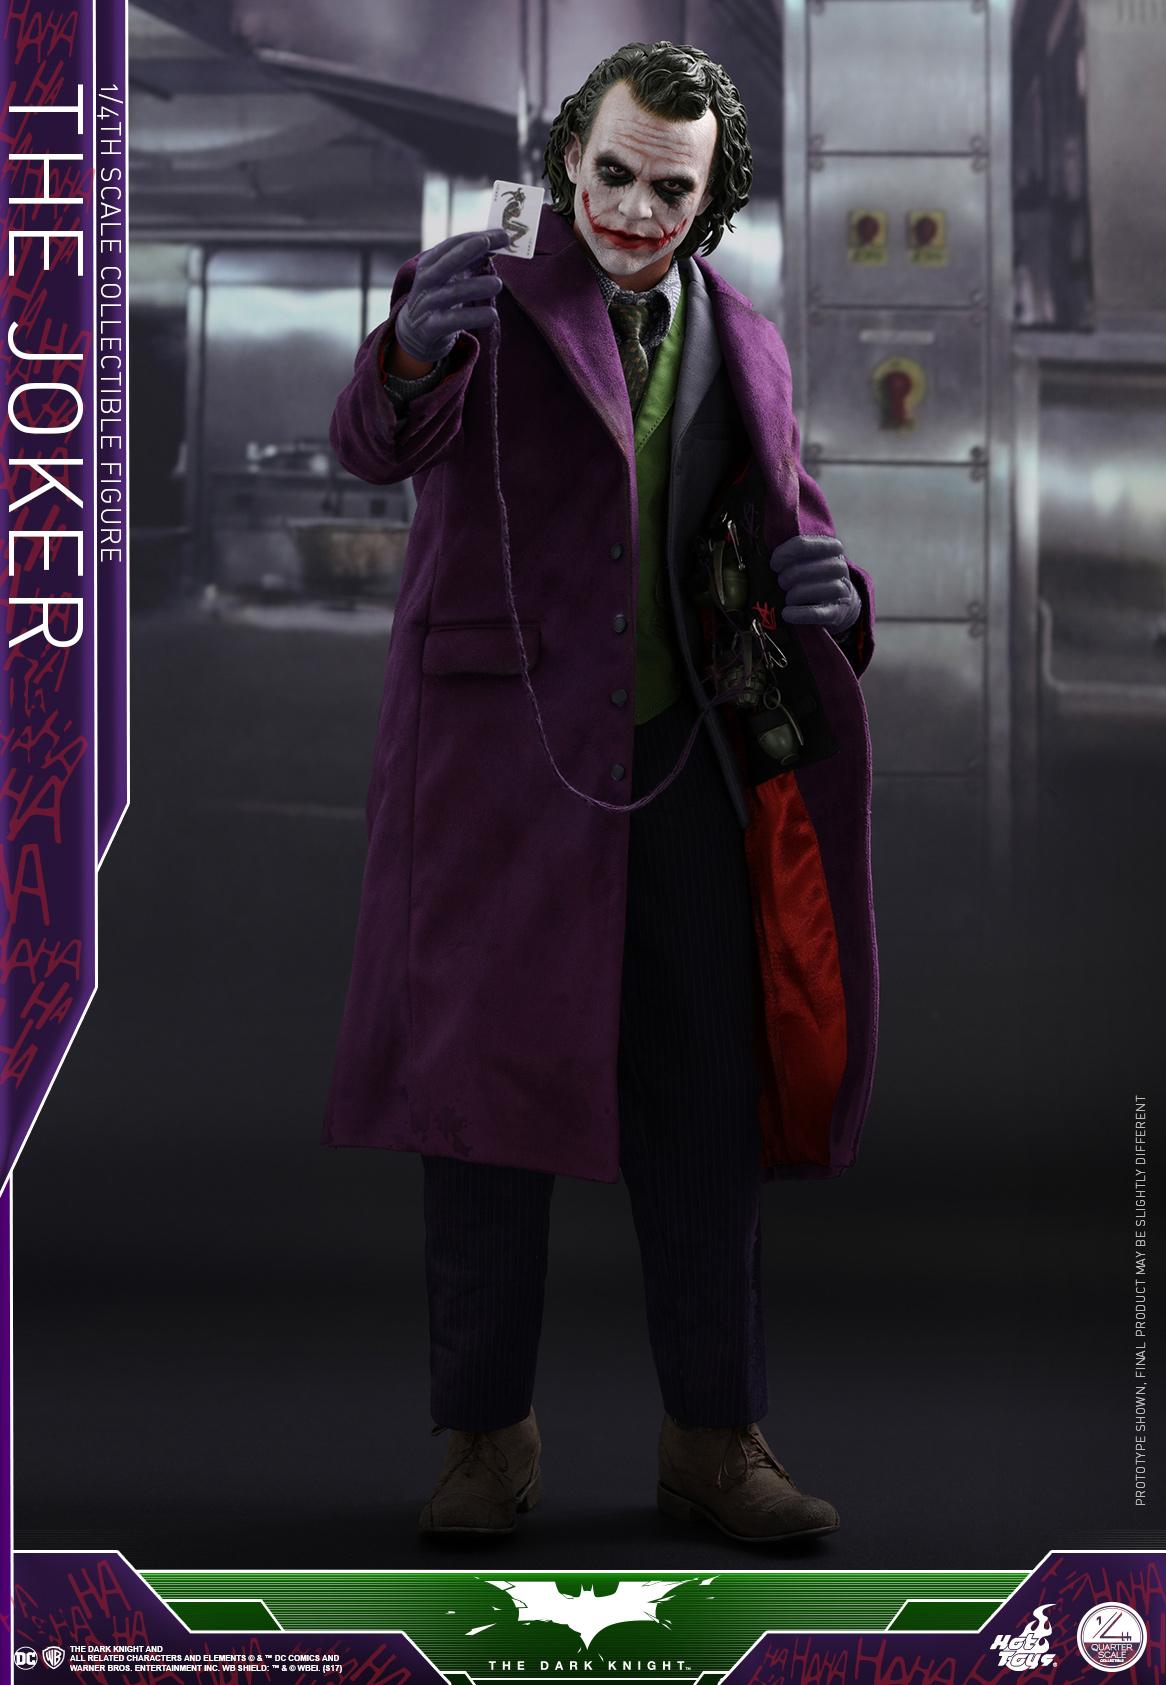 Hot-Toys---The-Dark-Knight---The-Joker-Collectible-Figure_PR7